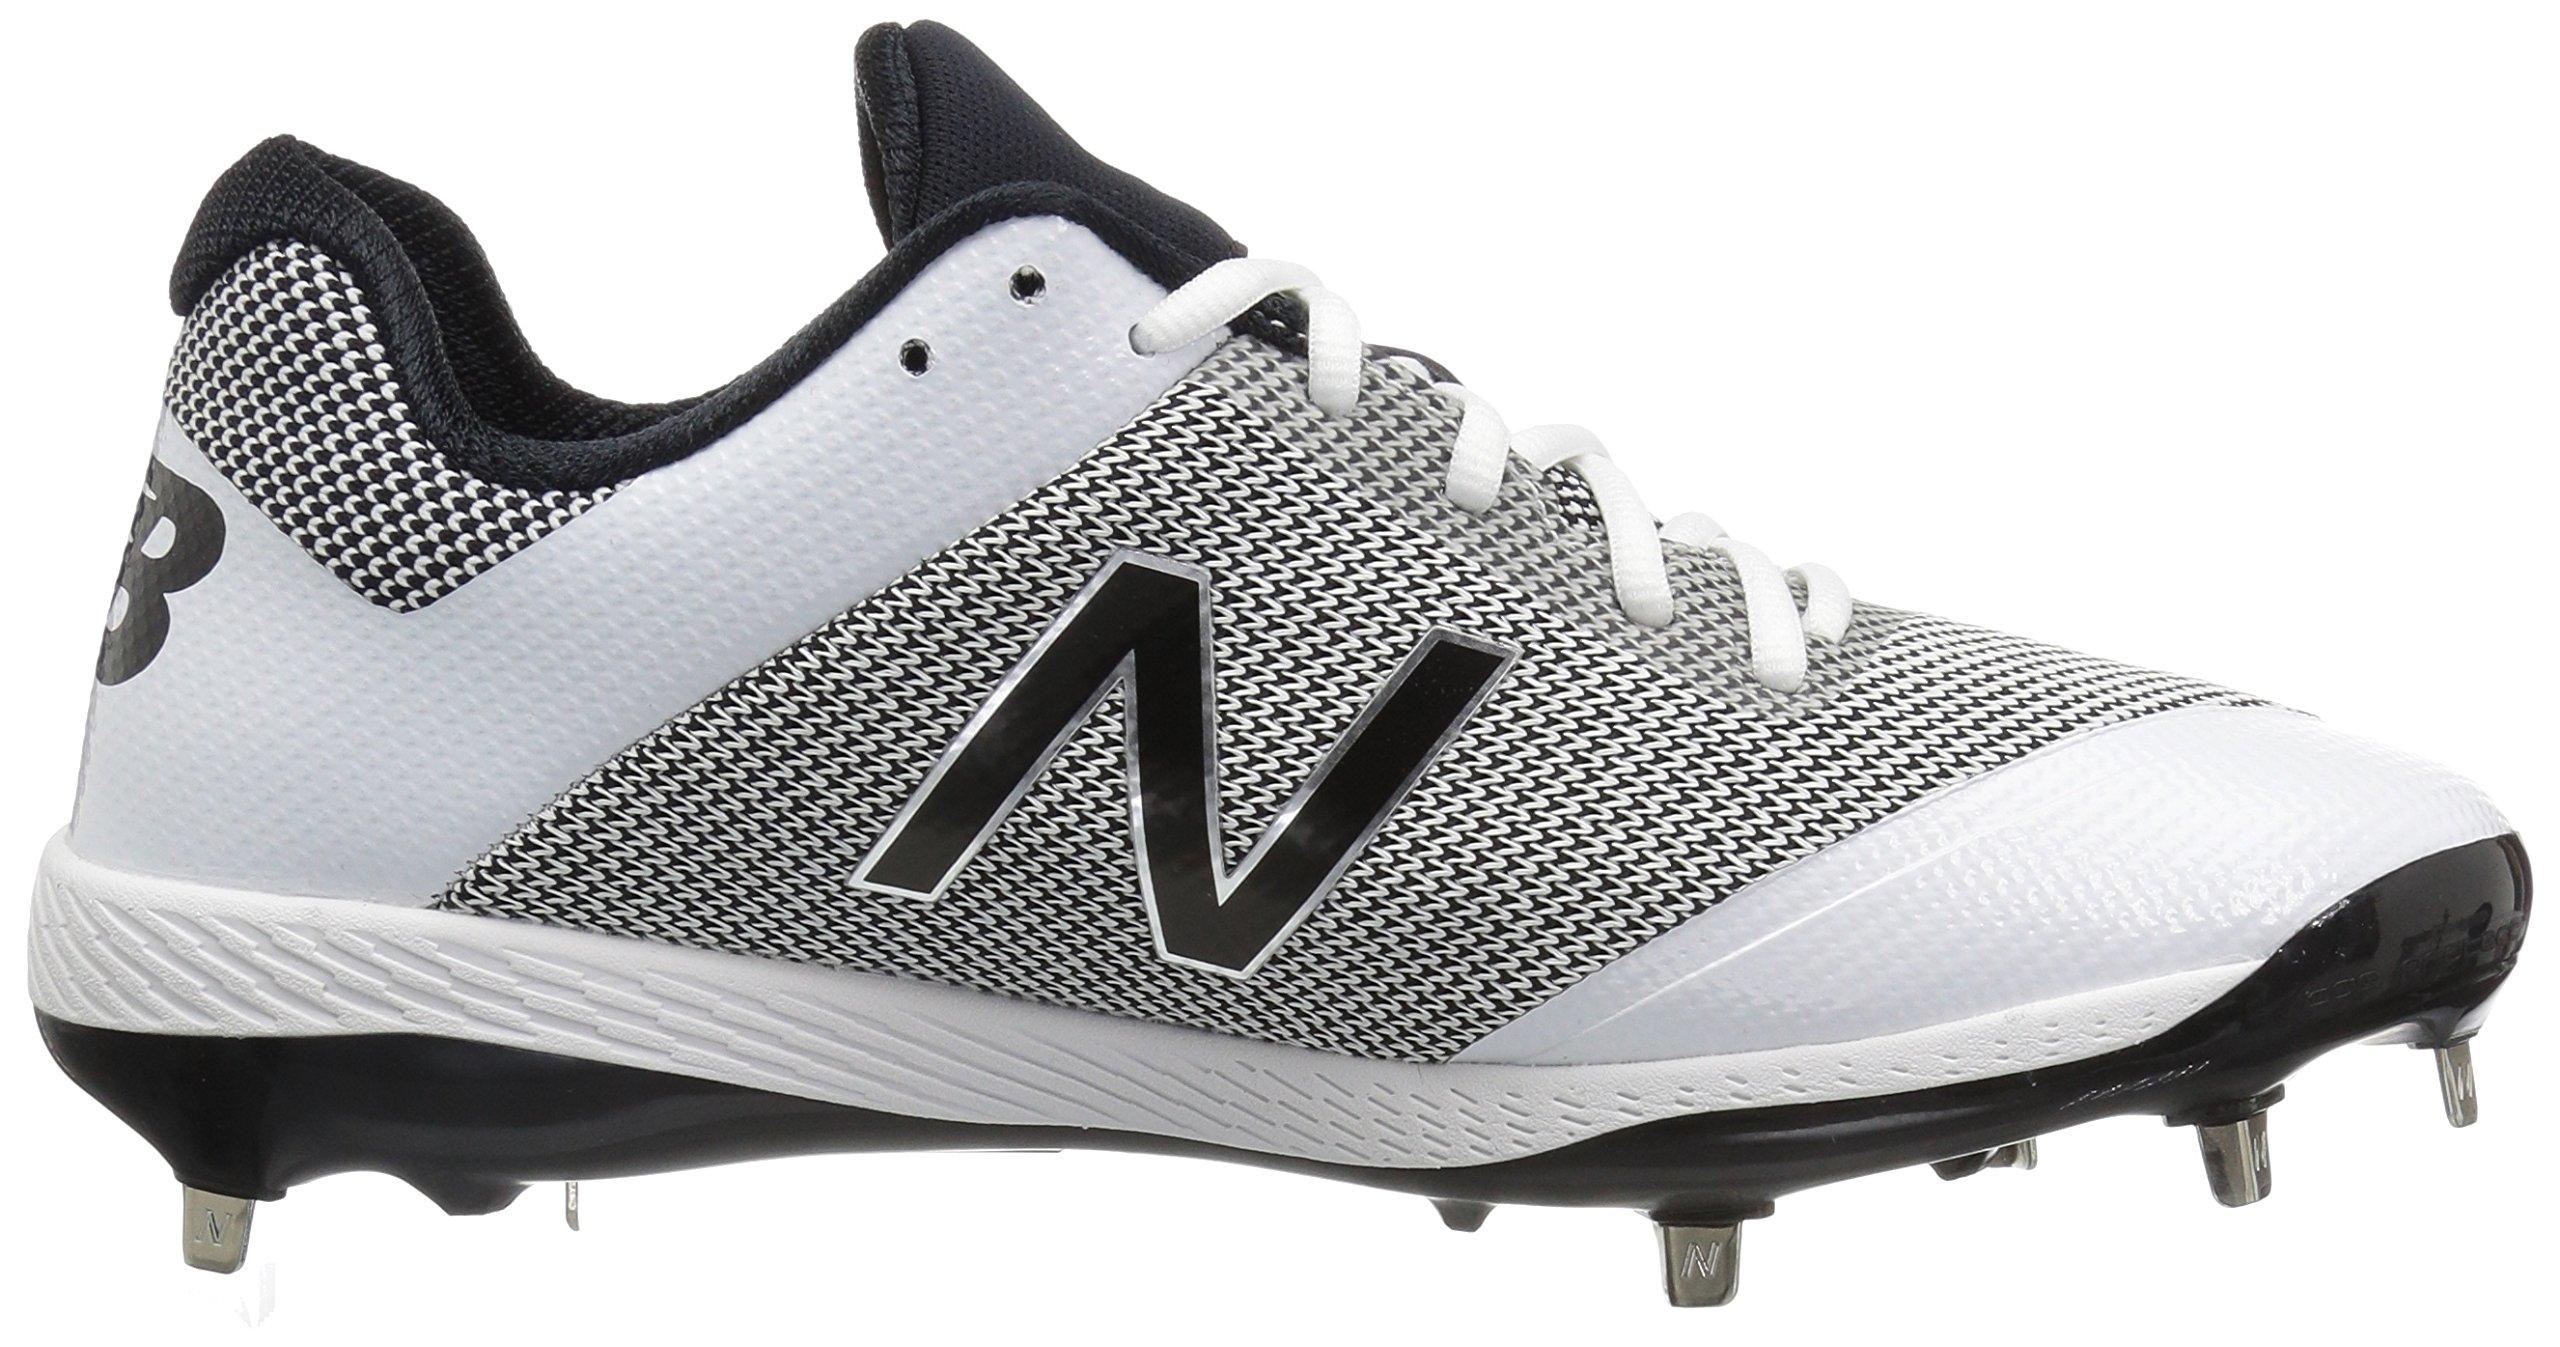 New Balance Men's L4040v4 Metal Baseball Shoe, Silver/Camo, 7.5 2E US by New Balance (Image #7)